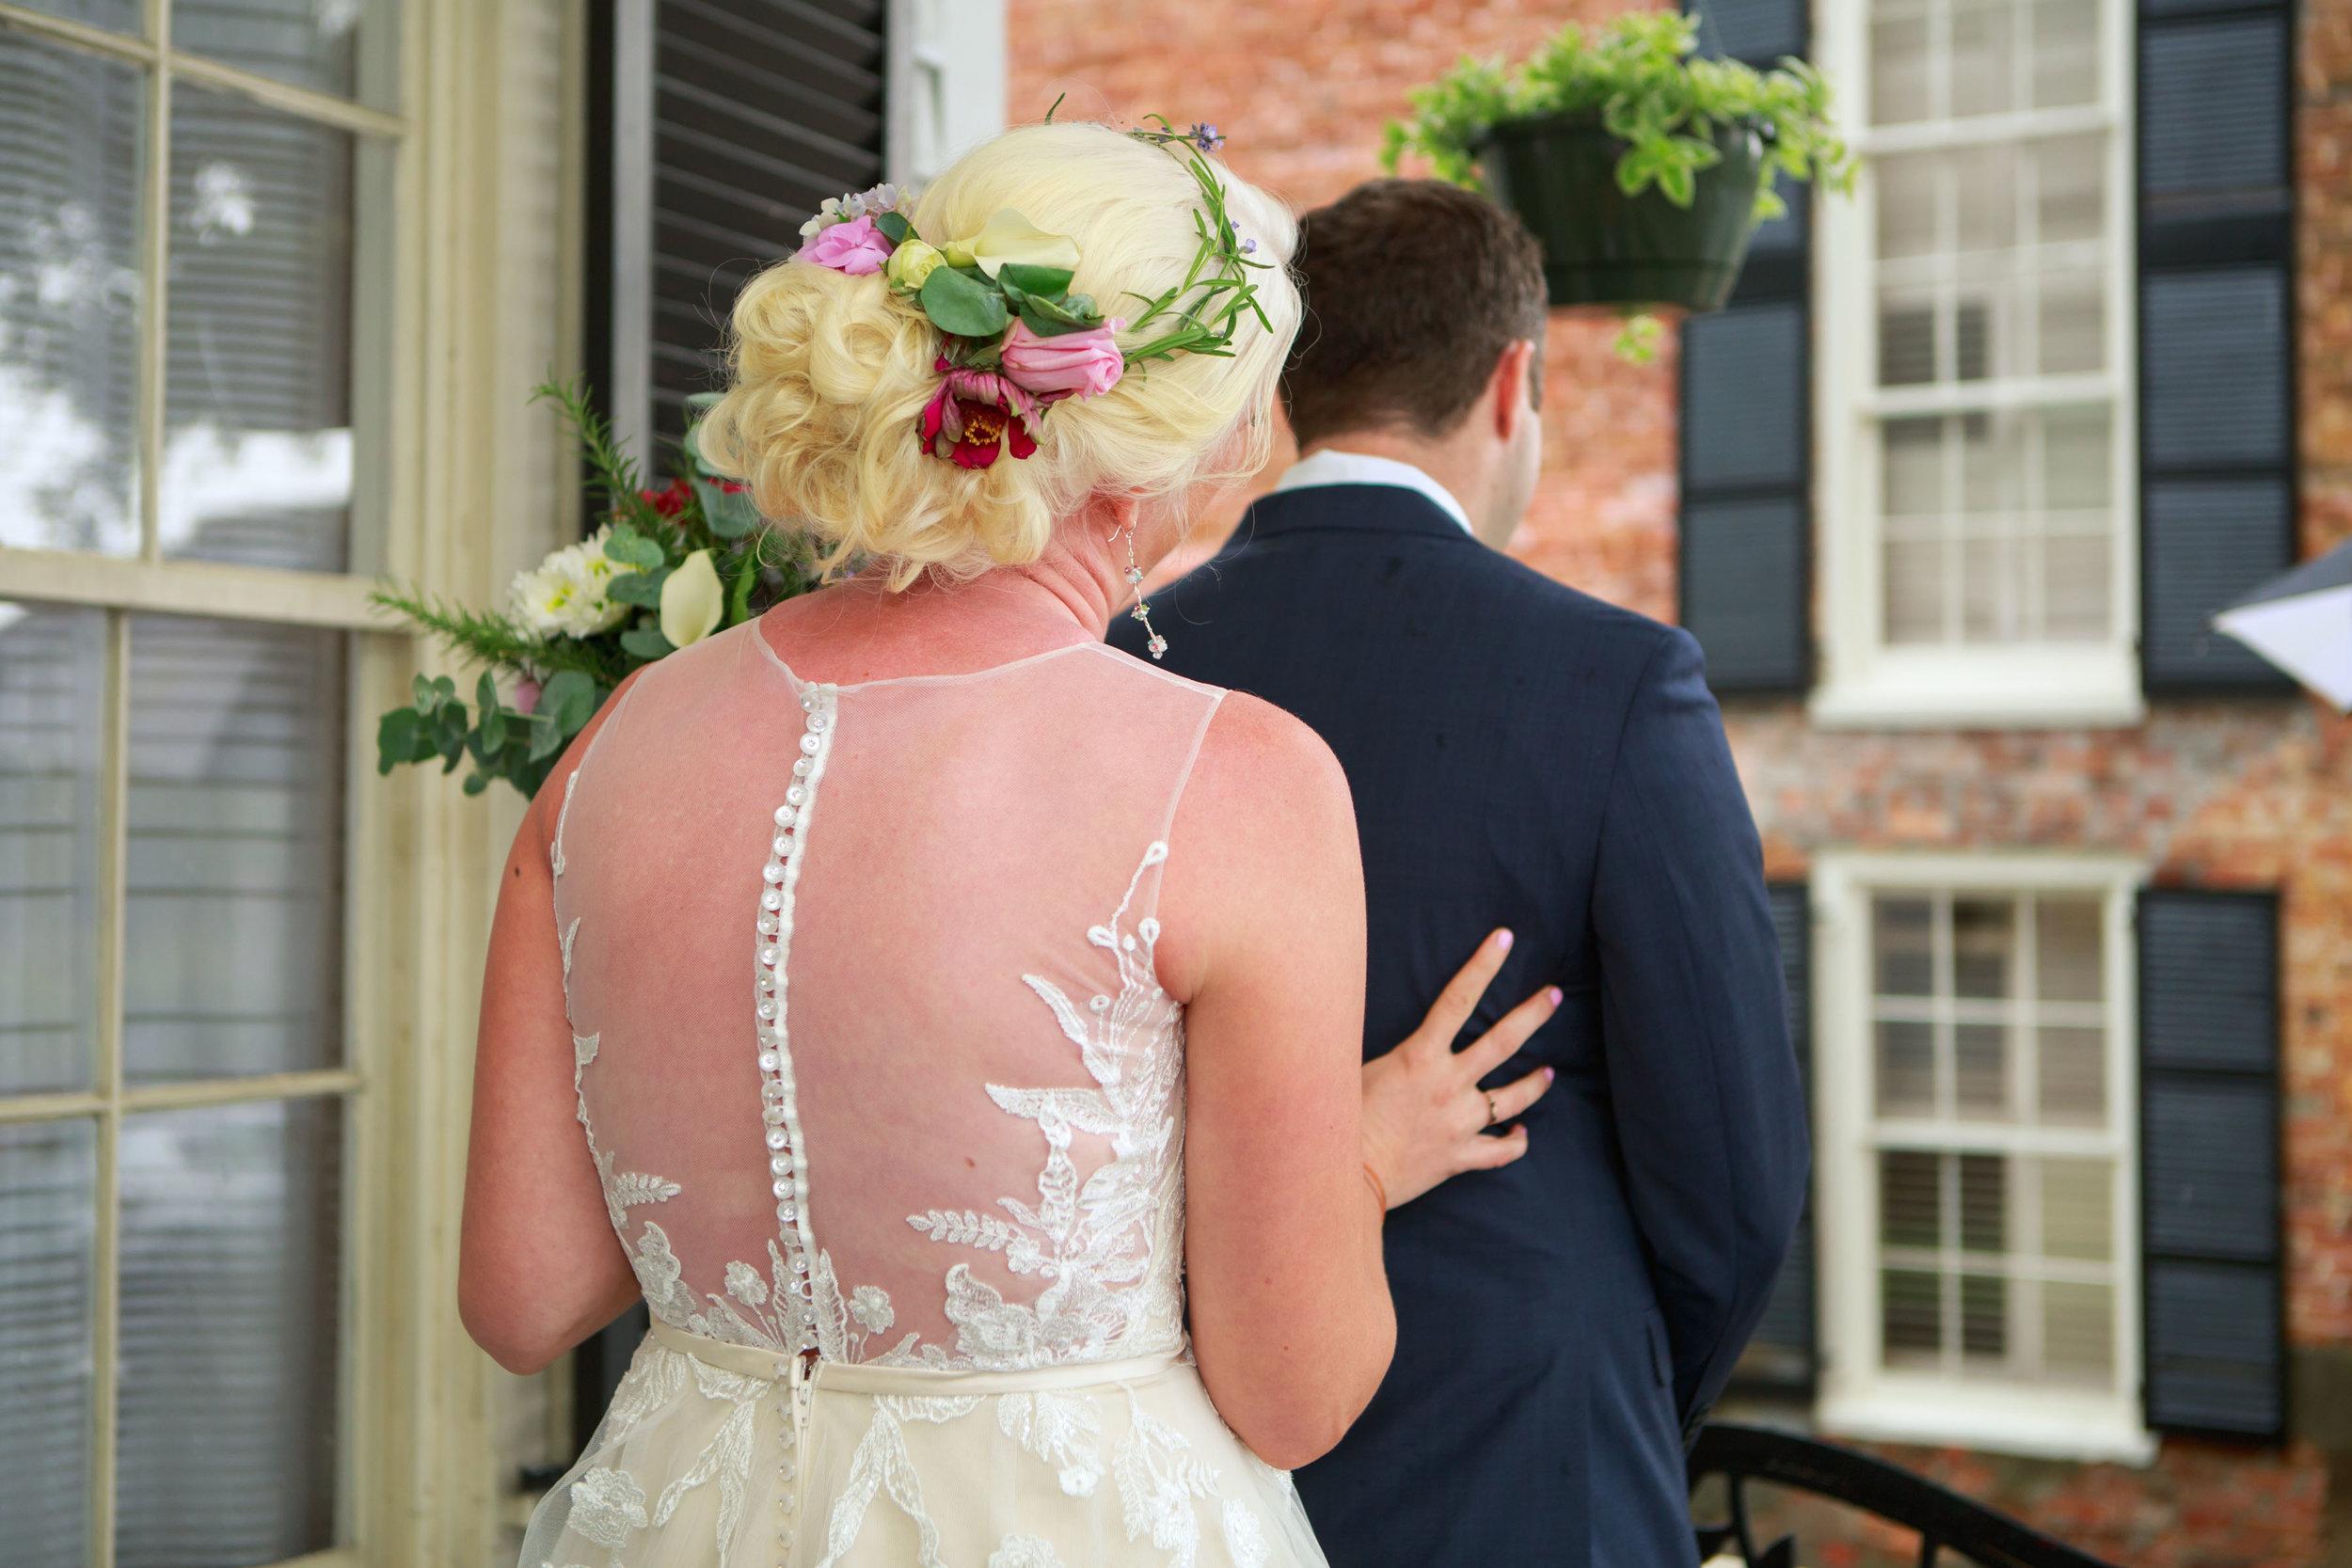 128-South-Wedding-Tiffany-Abruzzo-Photography-First-Look-3.jpg